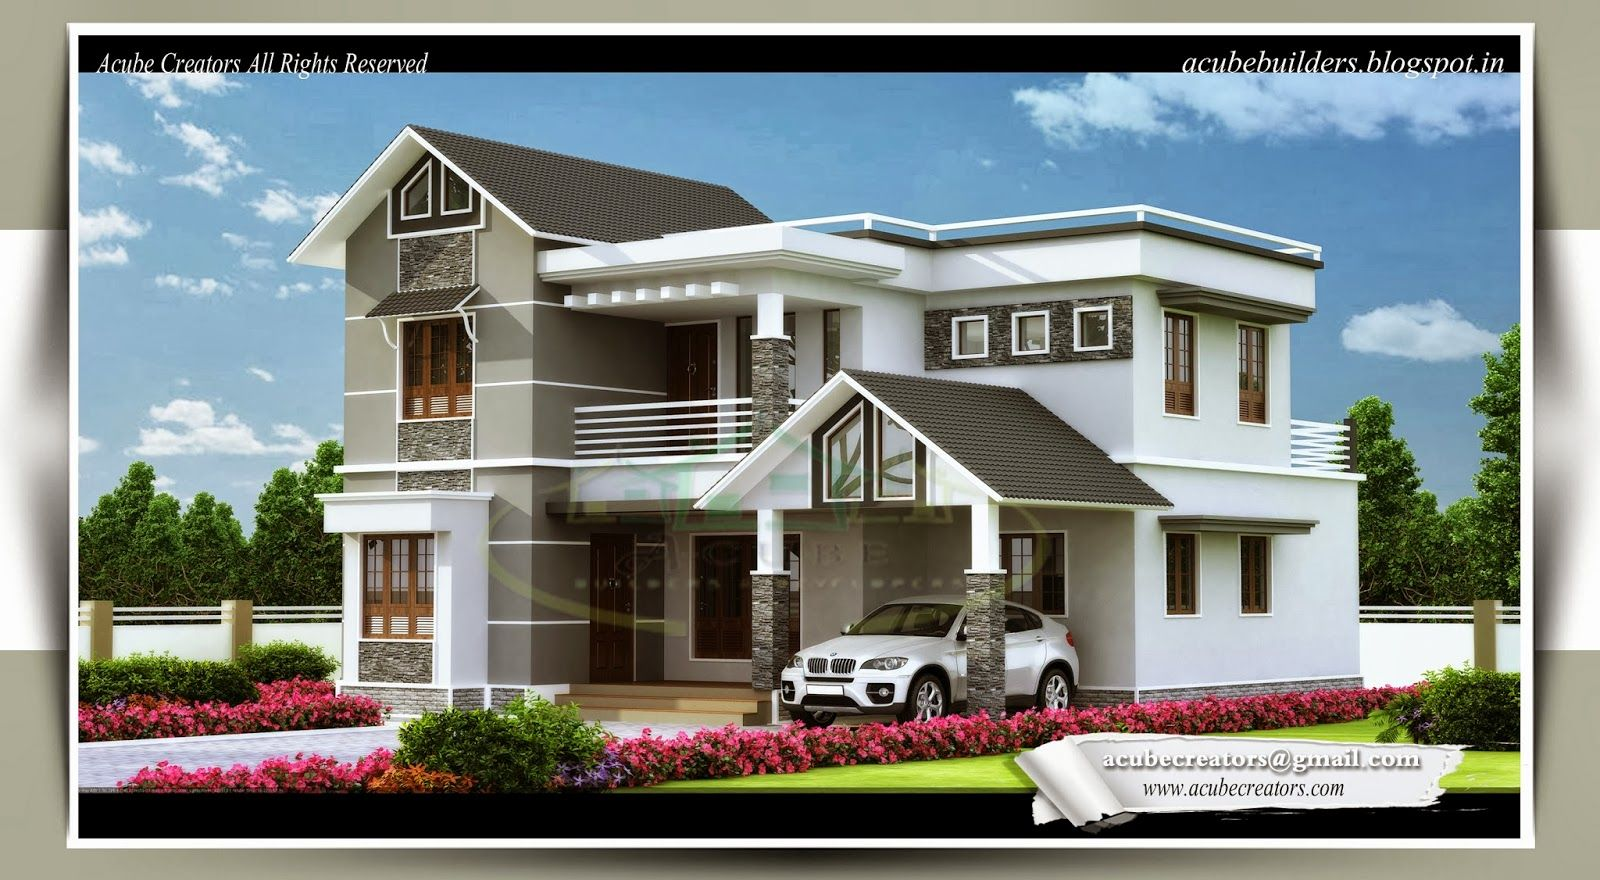 Home Design Gallery Fresh Ideas Kerala Home Design Photos | home | Kerala house design, House ...